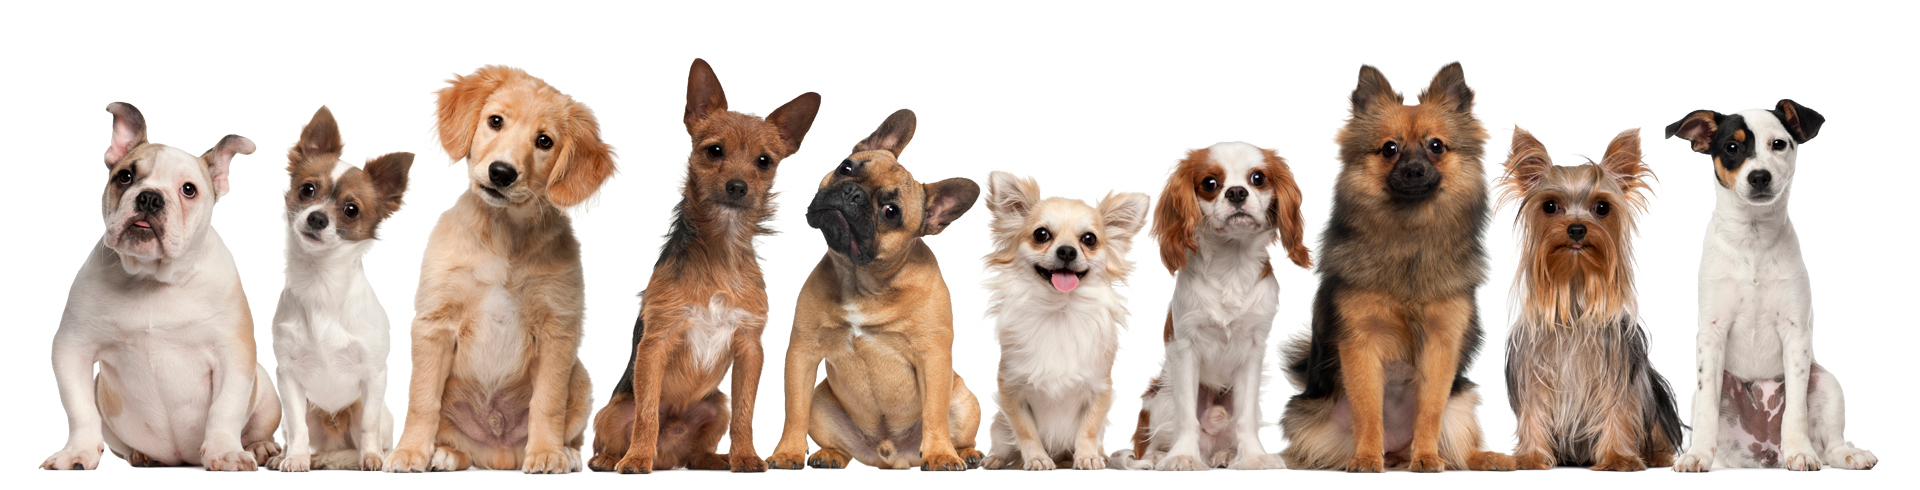 Dogshog Group